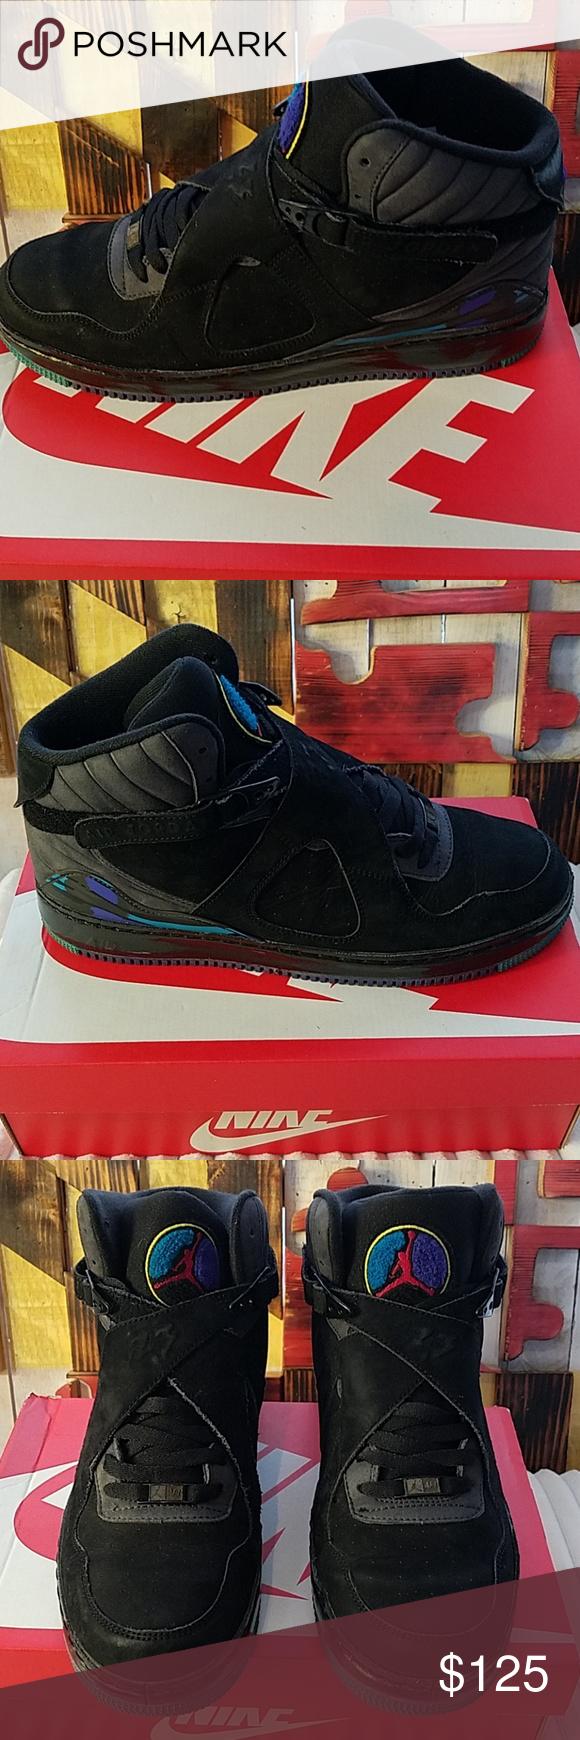 1fedfd5037d Nike Jordan AJF 8 Mens Size 11 Nike Jordan AJF 8 Mens Size 11 Jordan Shoes  Athletic Shoes